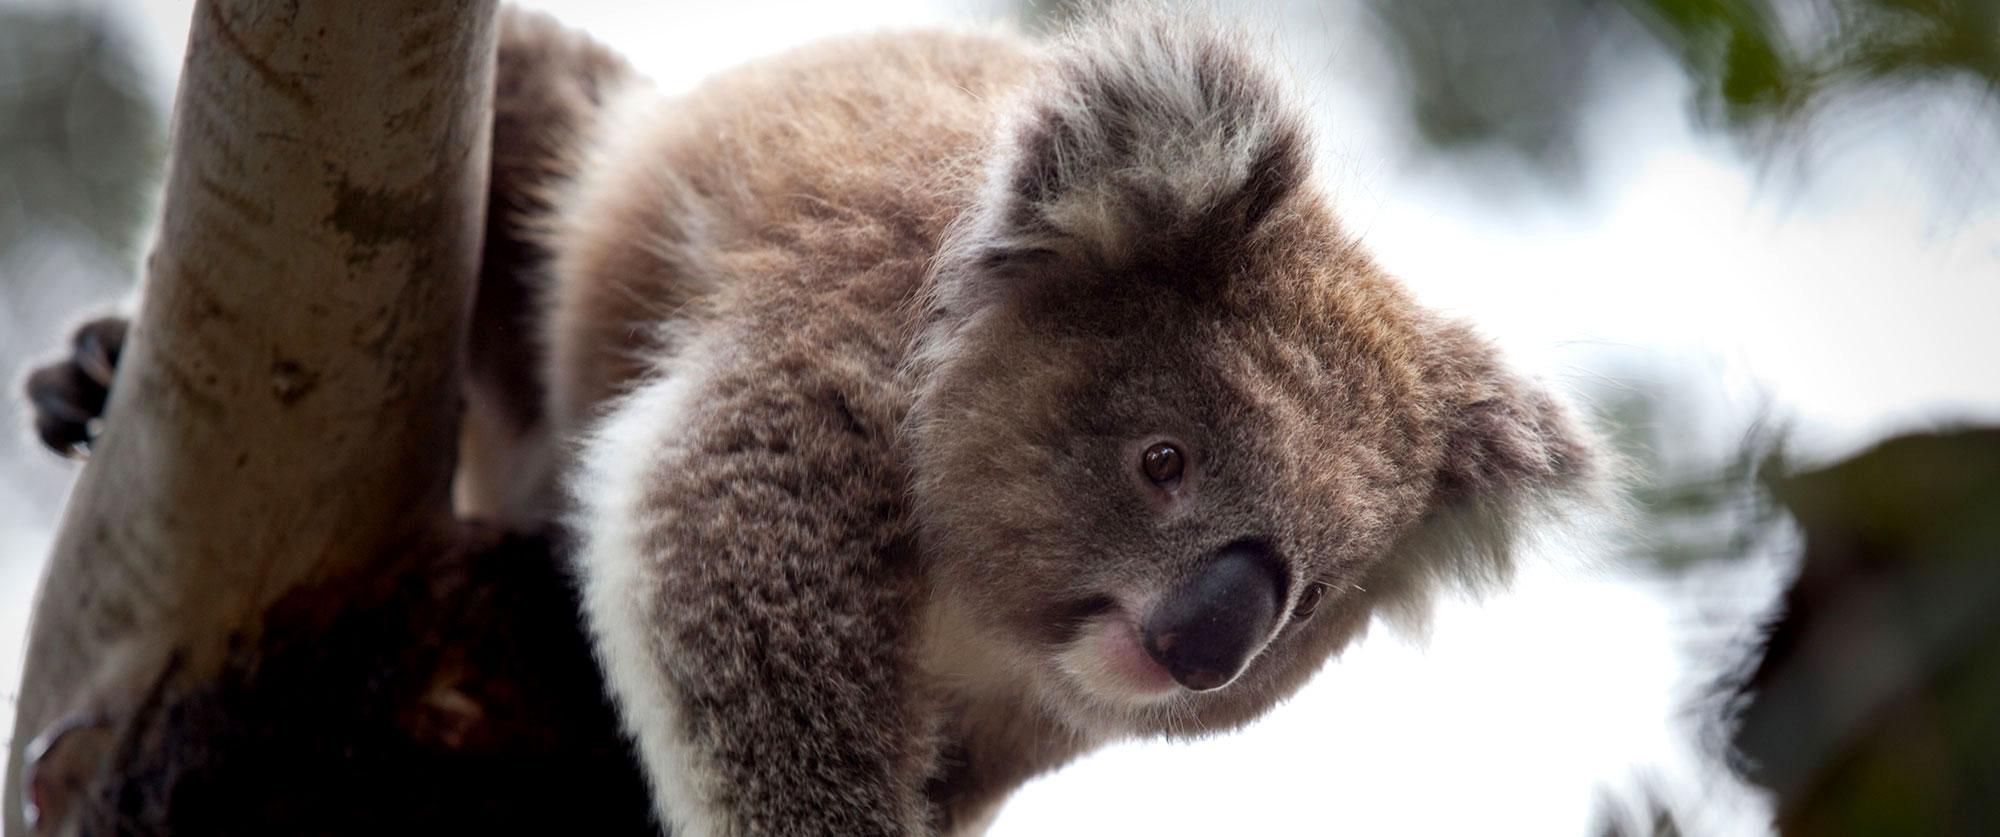 Australia Winter Getaway - Cuddle a Koala